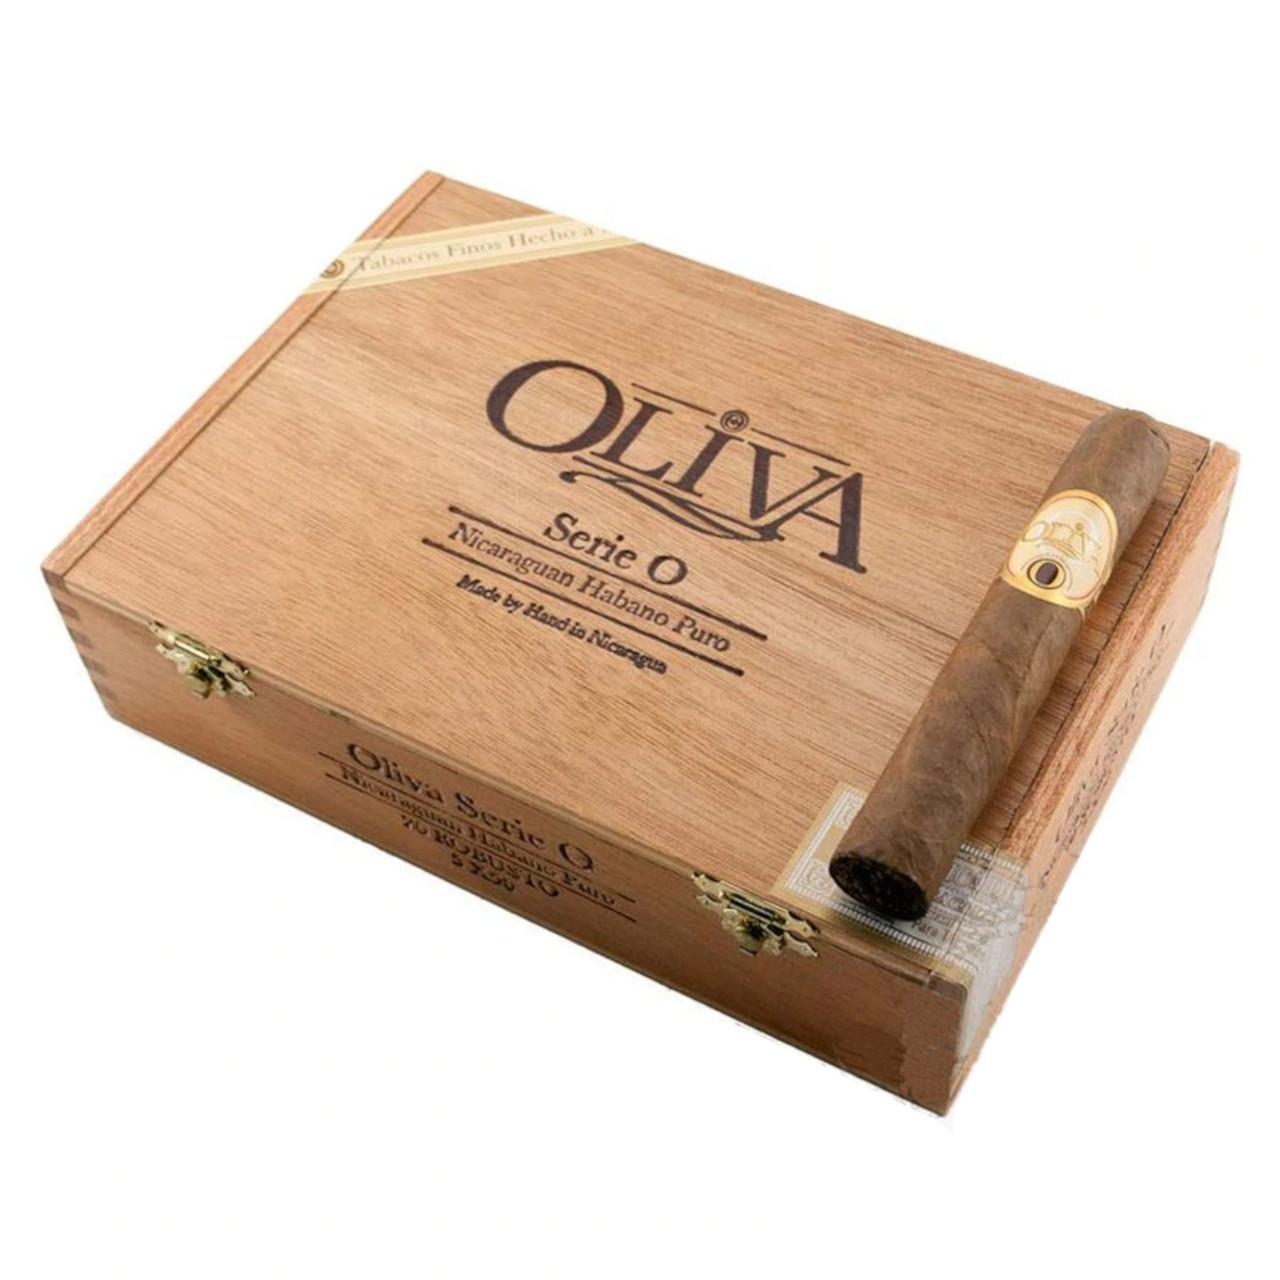 Oliva Serie O Robusto Cigars - 5 x 50 (Box of 20)